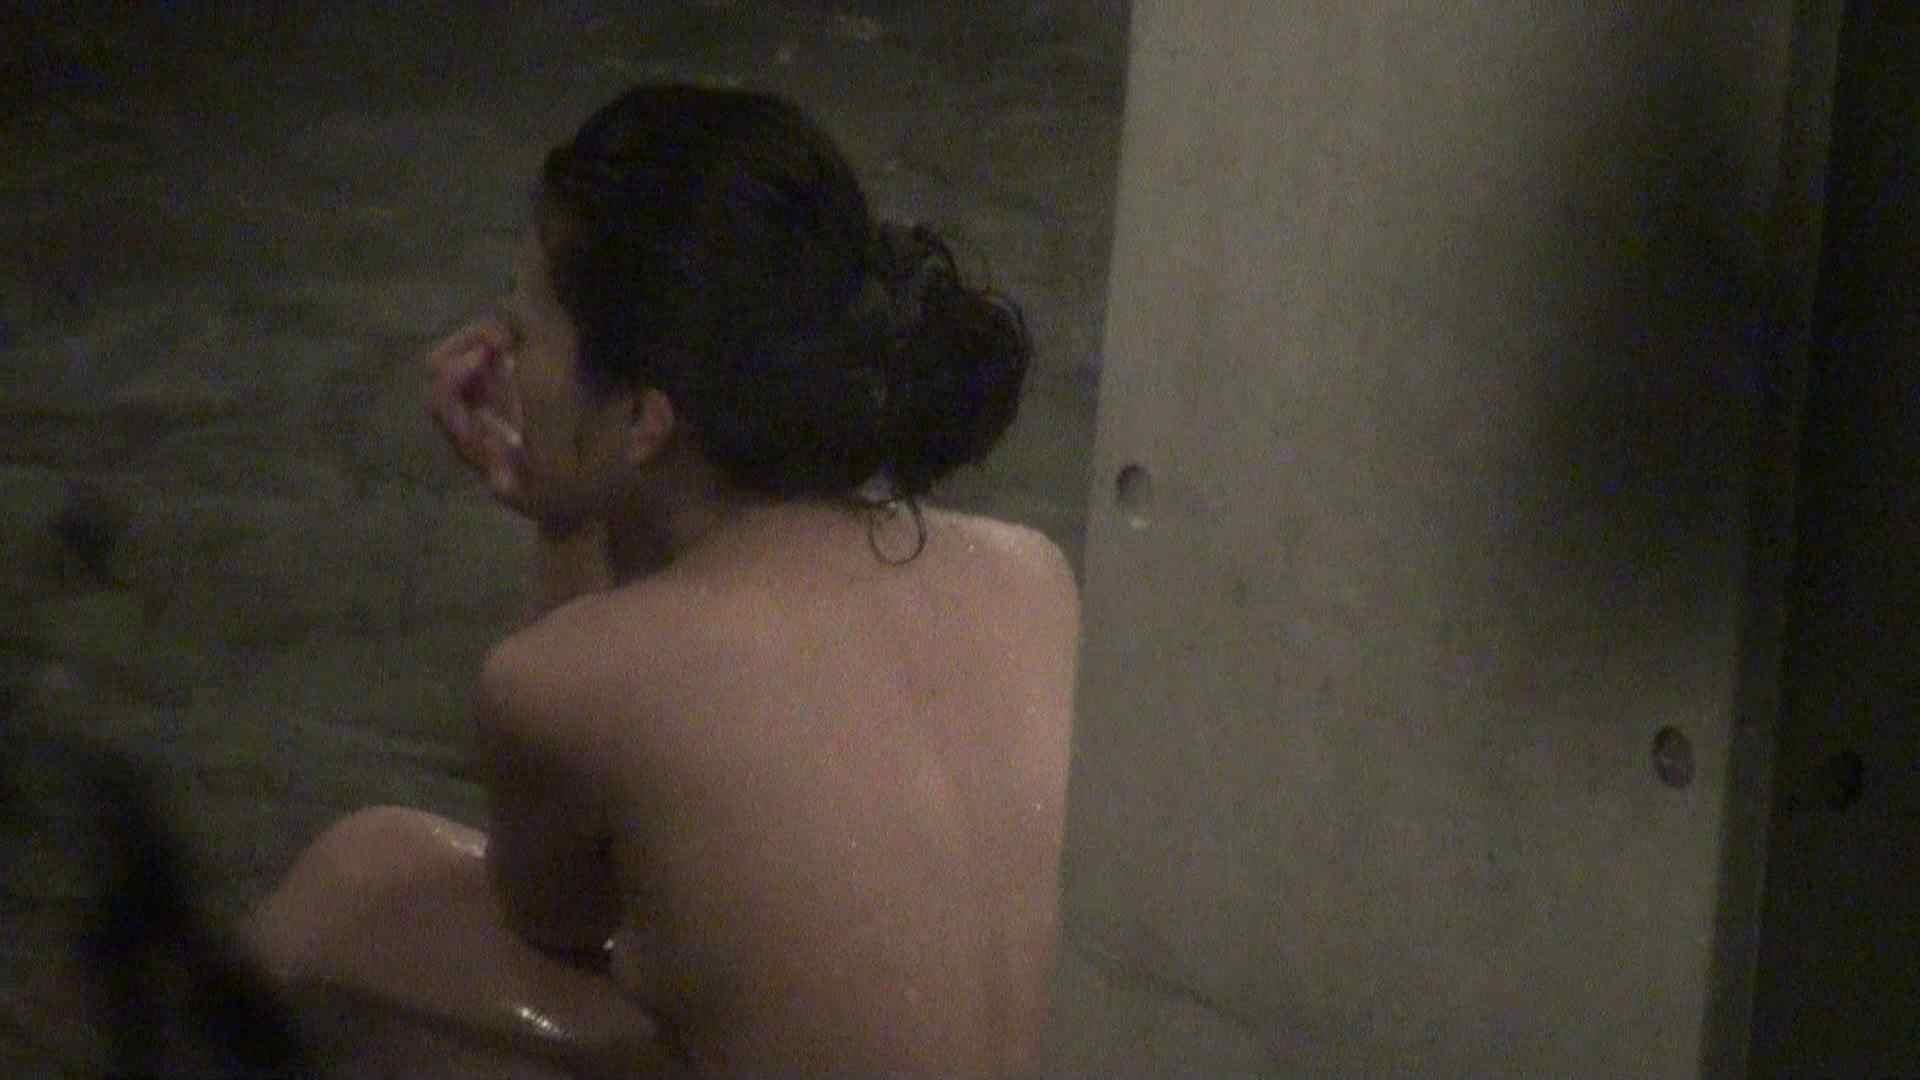 Aquaな露天風呂Vol.375 OLエロ画像 盗撮おめこ無修正動画無料 78PICs 47